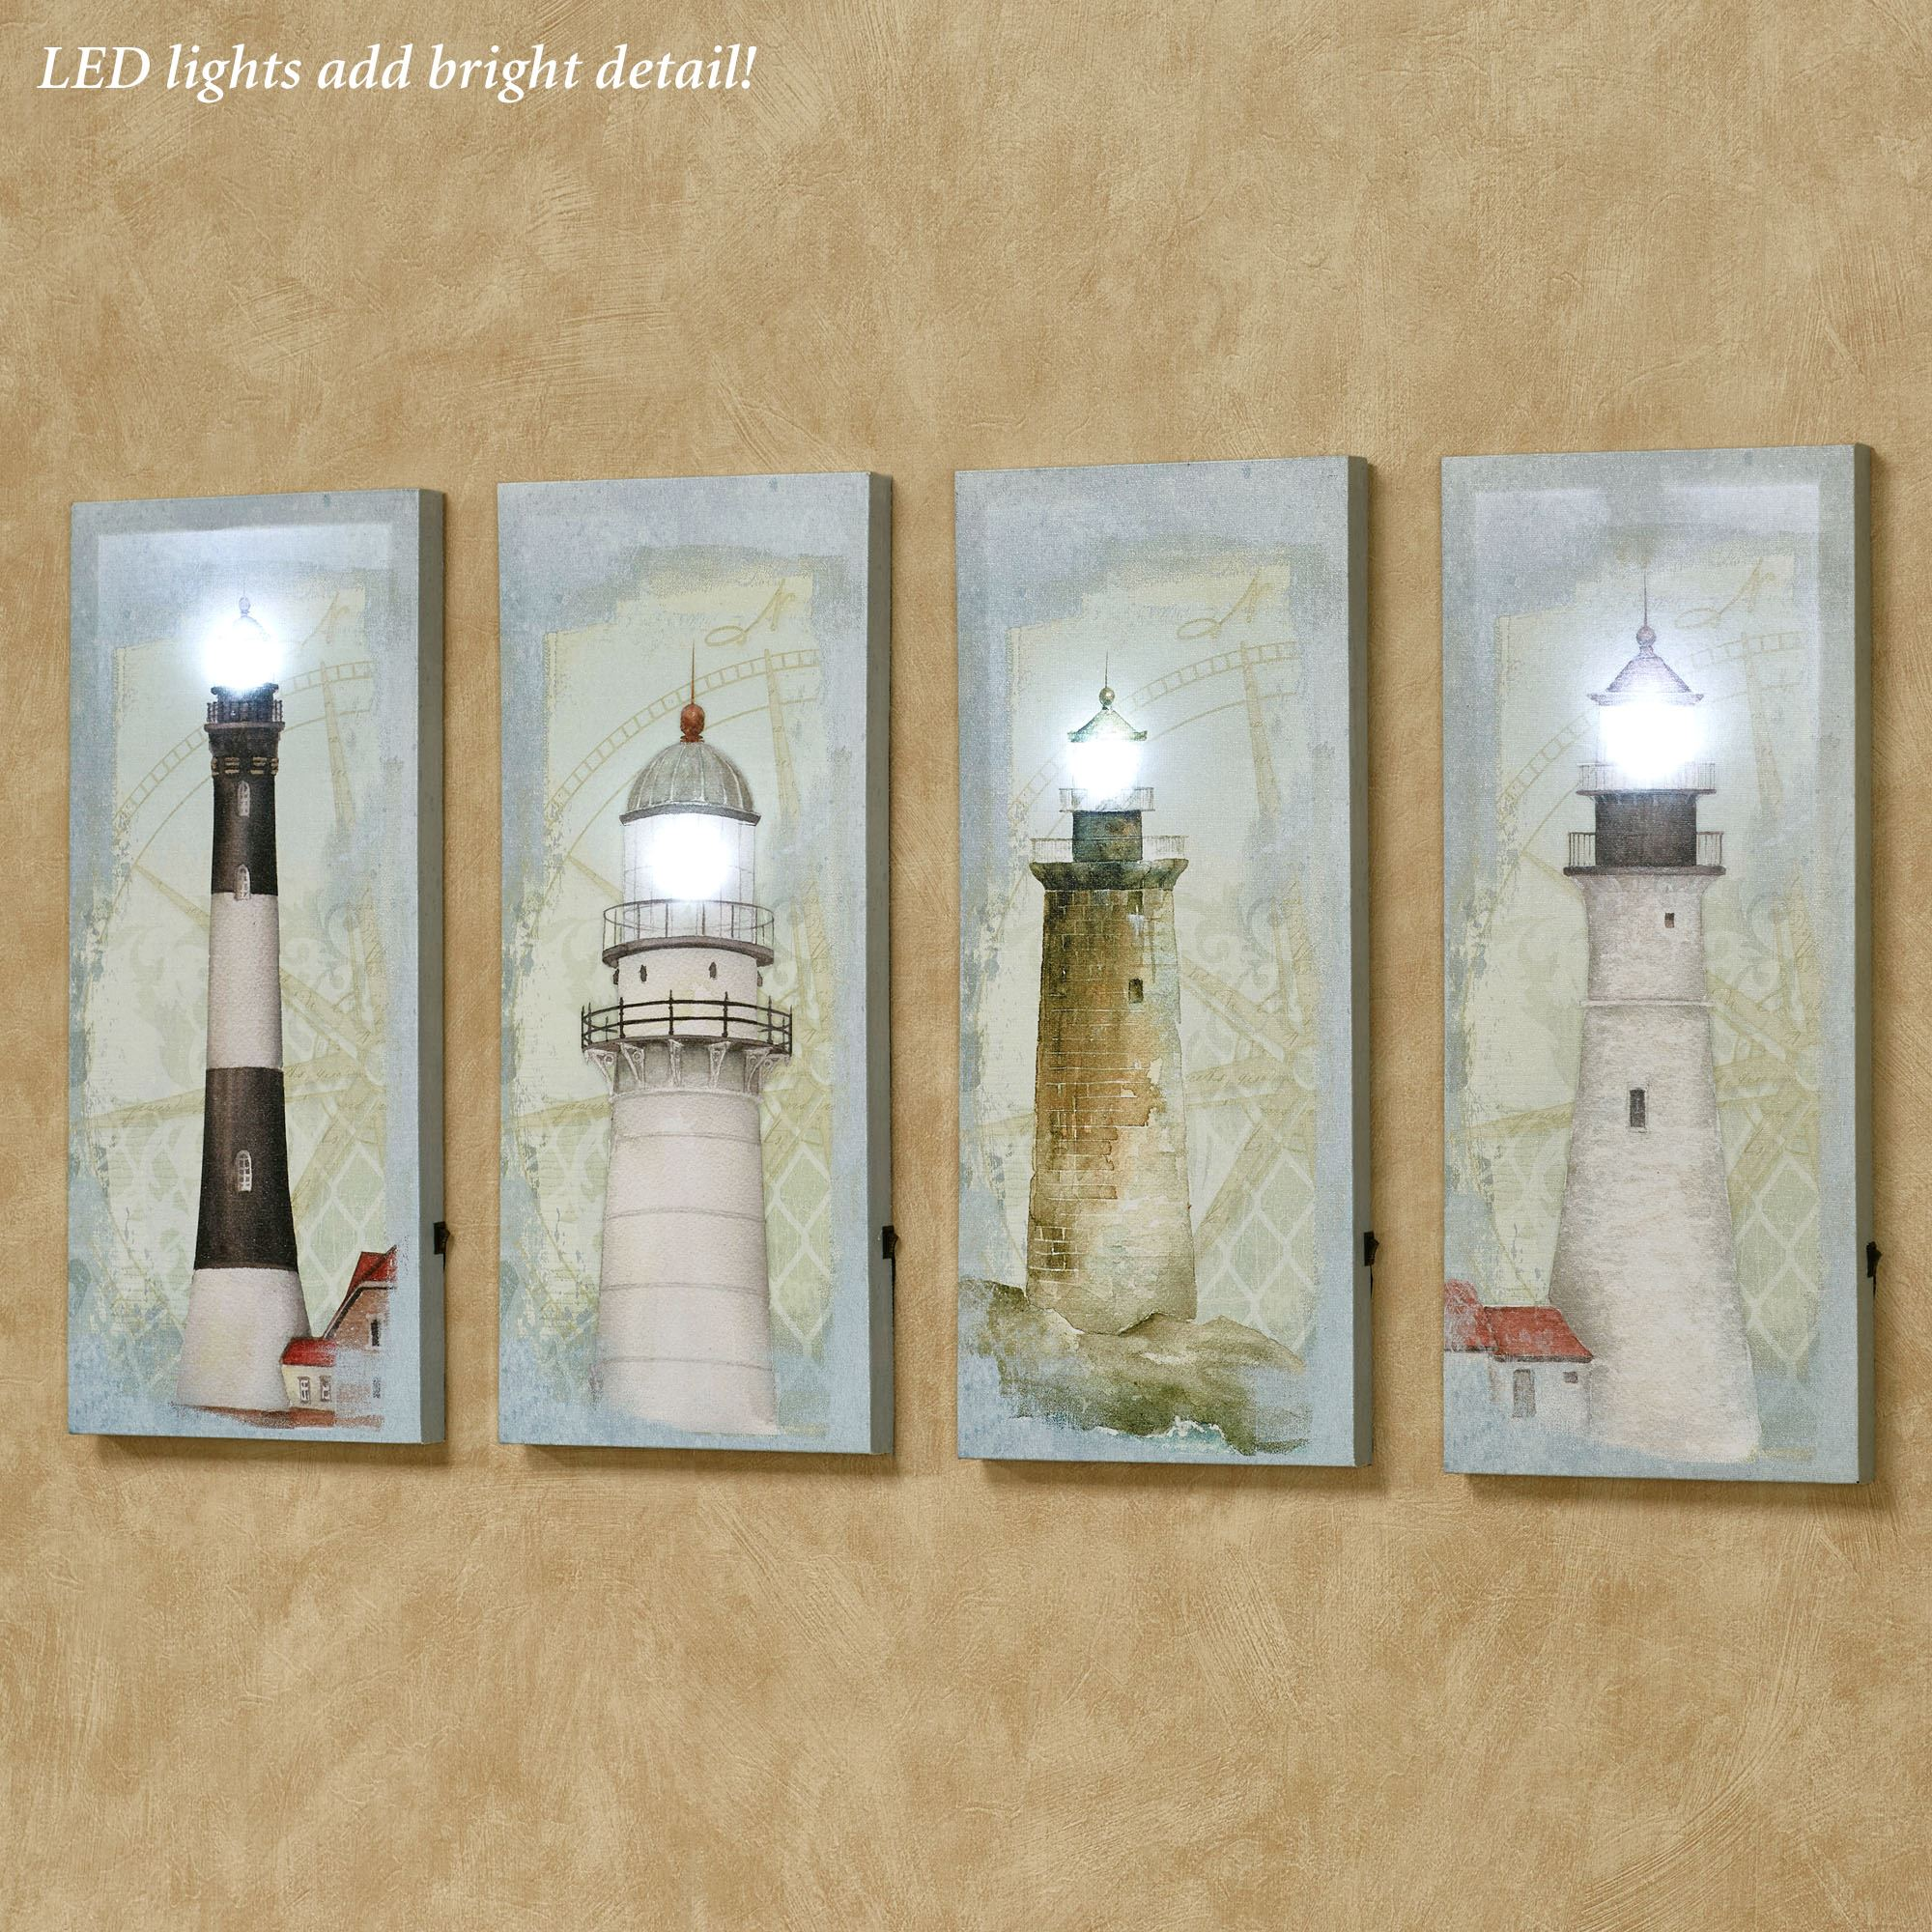 Coastal Lighthouse LED Lighted Canvas Wall Art Set